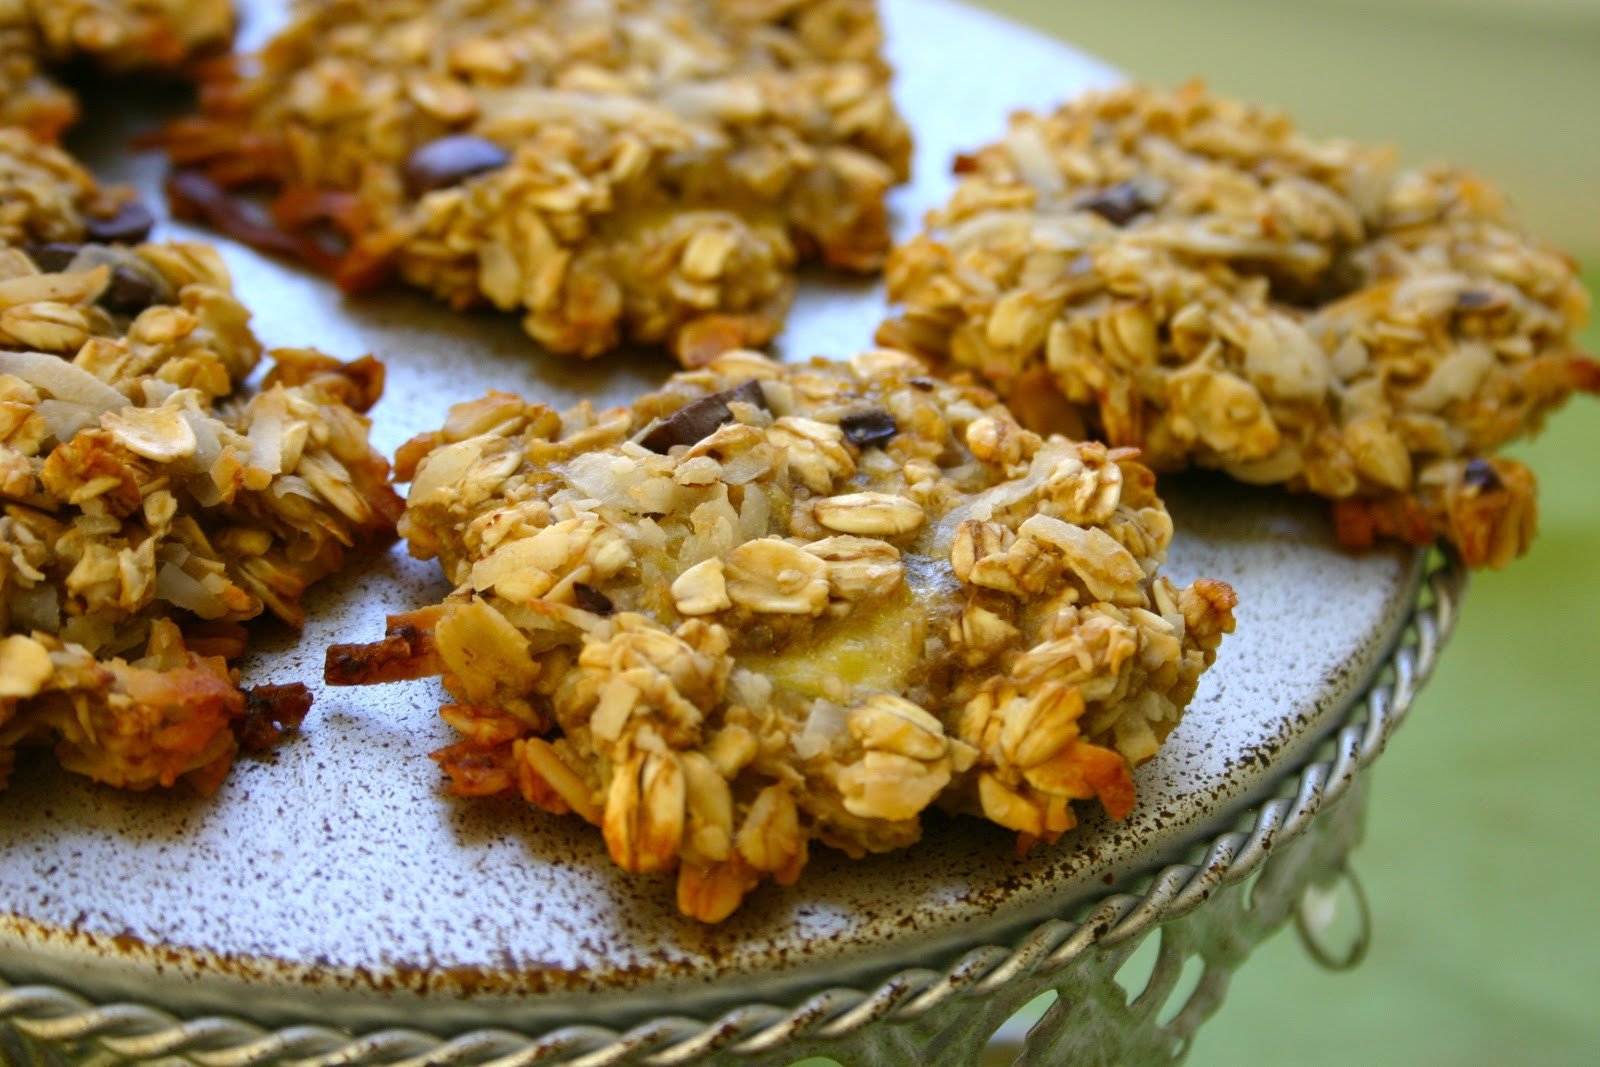 Healthy Oatmeal Cookies No Flour  Banana Oatmeal Cookies No Flour Butter Sugar or Egg